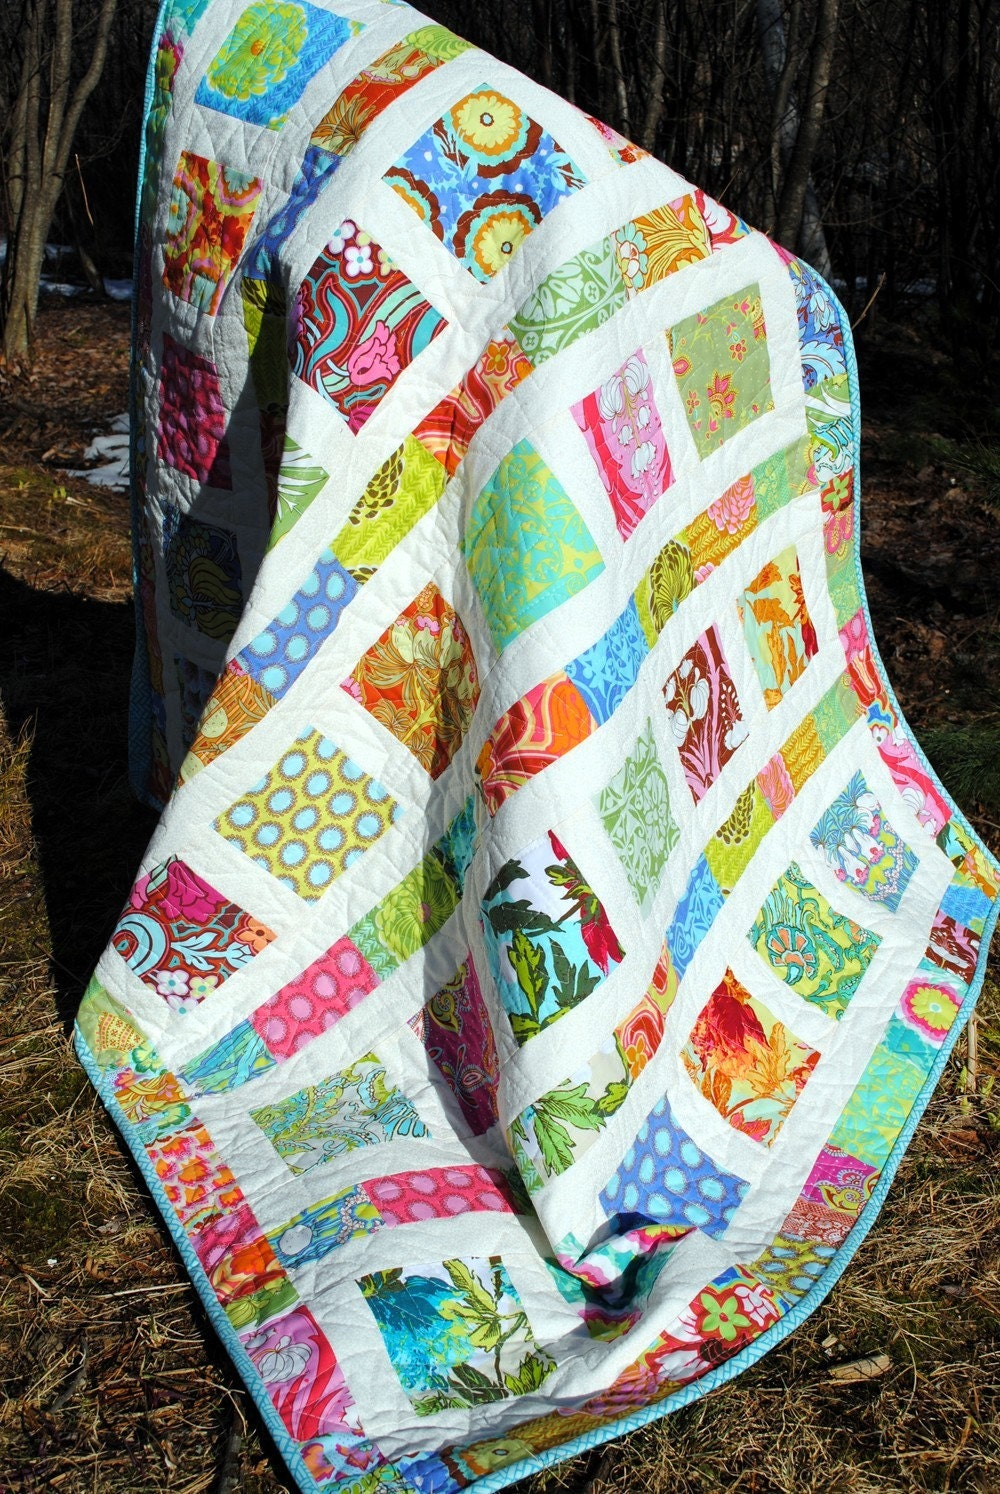 Log Cabin Quilt Design Ideas